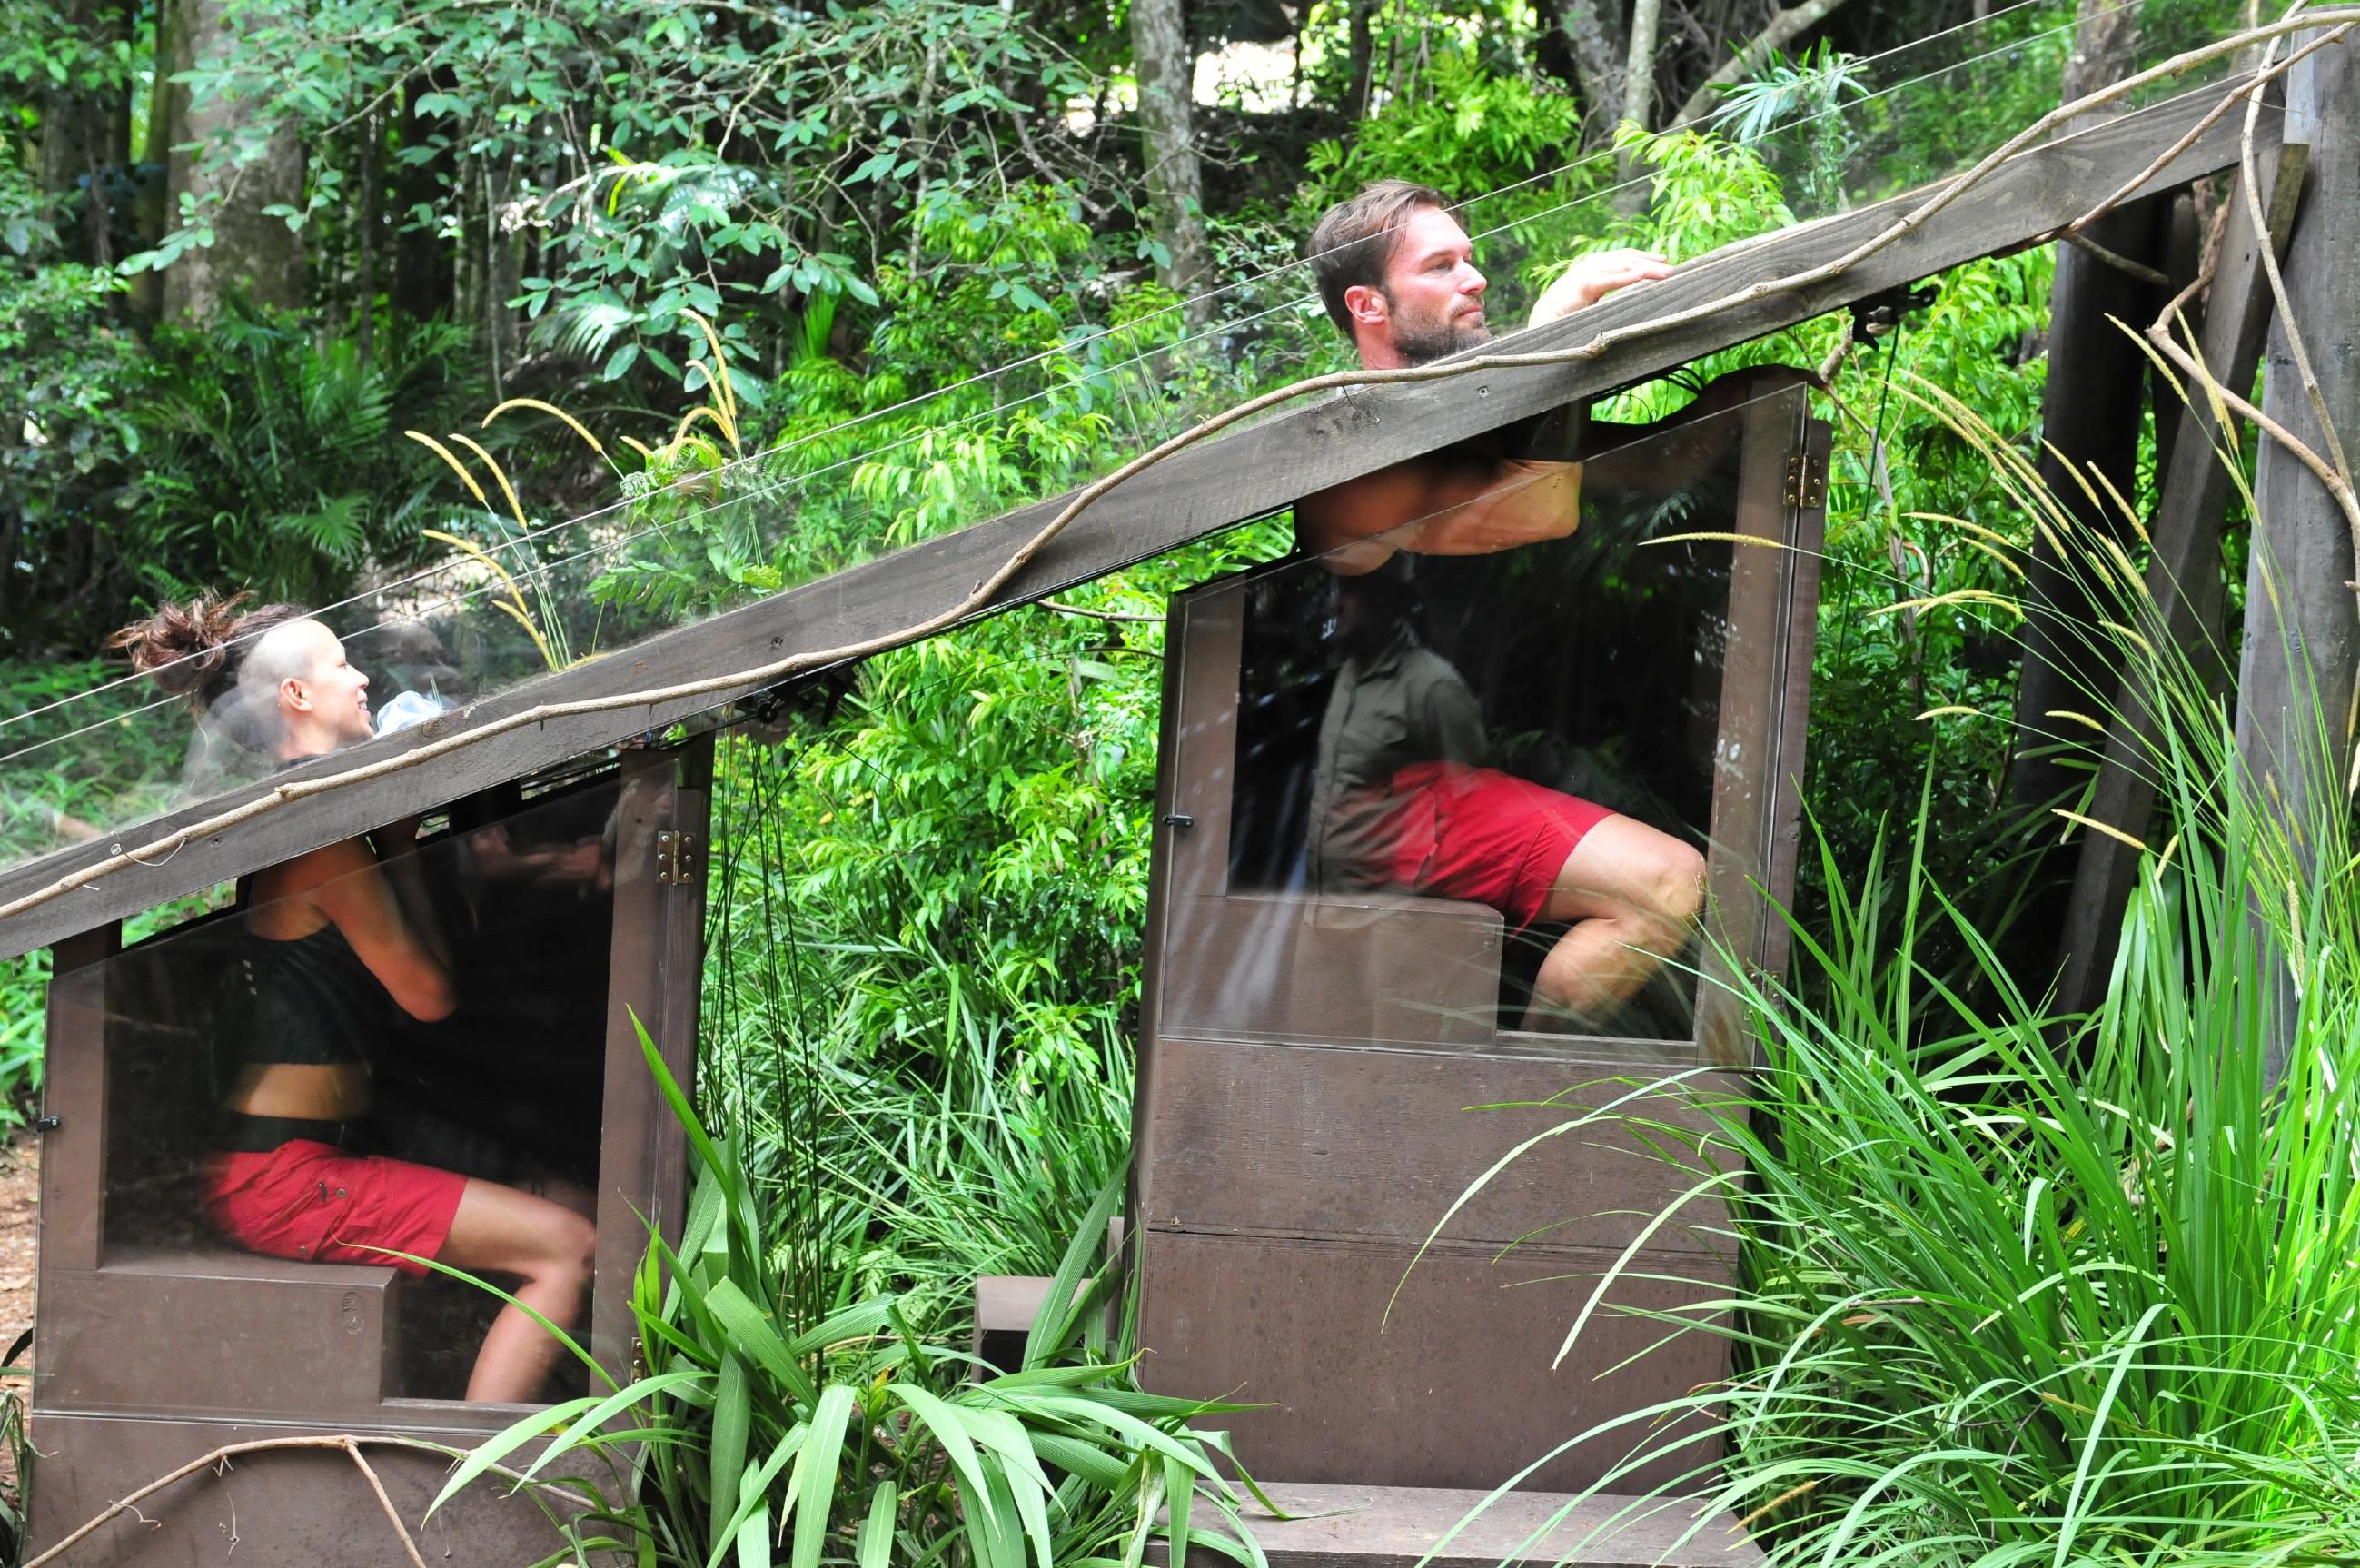 Dschungelprüfung Spülhölle